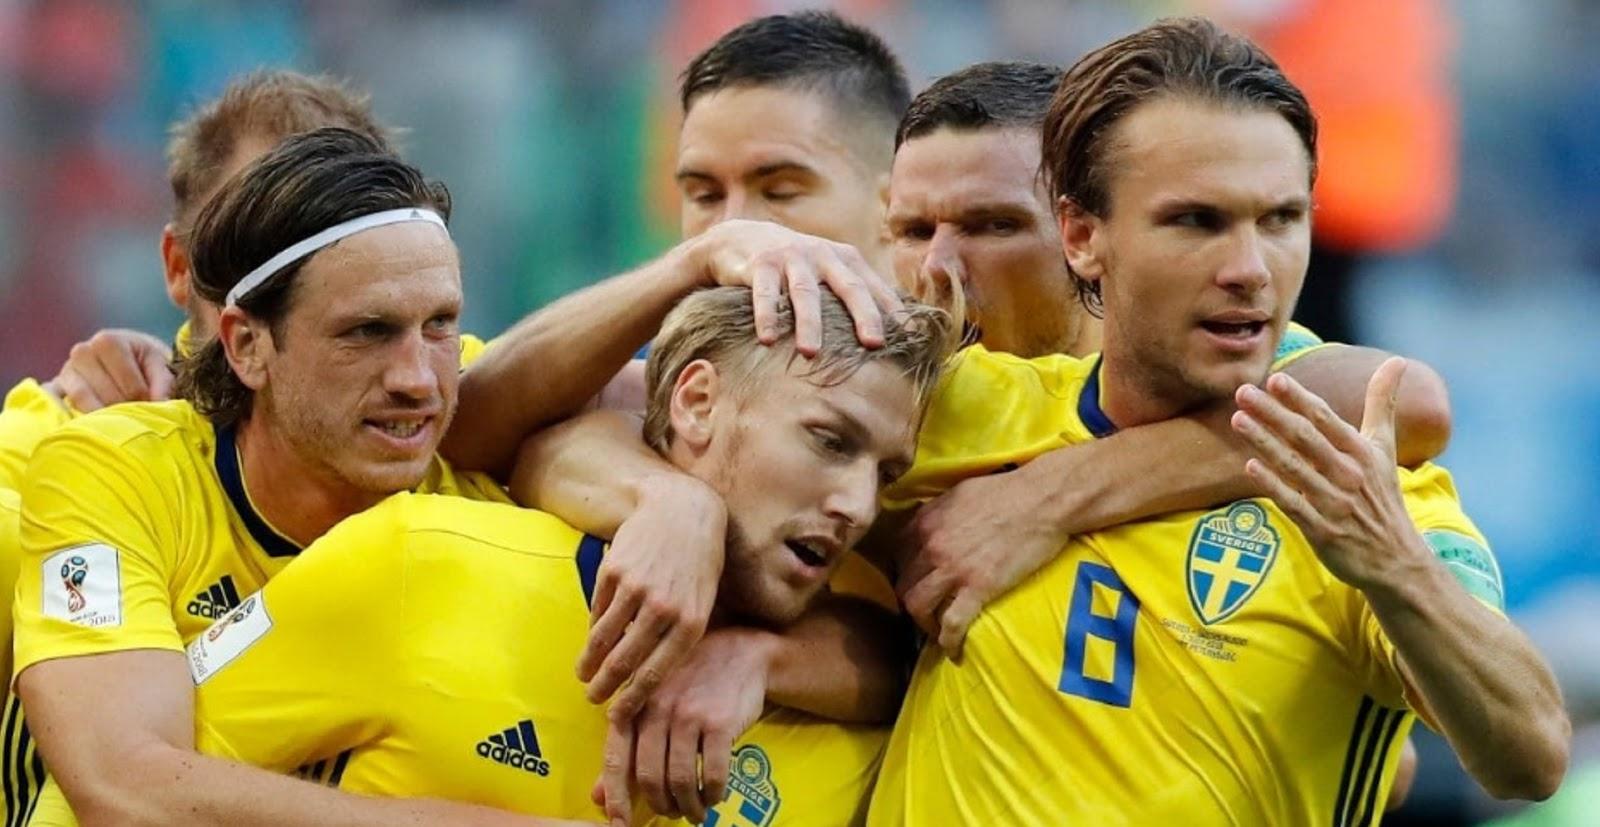 WORLD CUP, SWEDEN